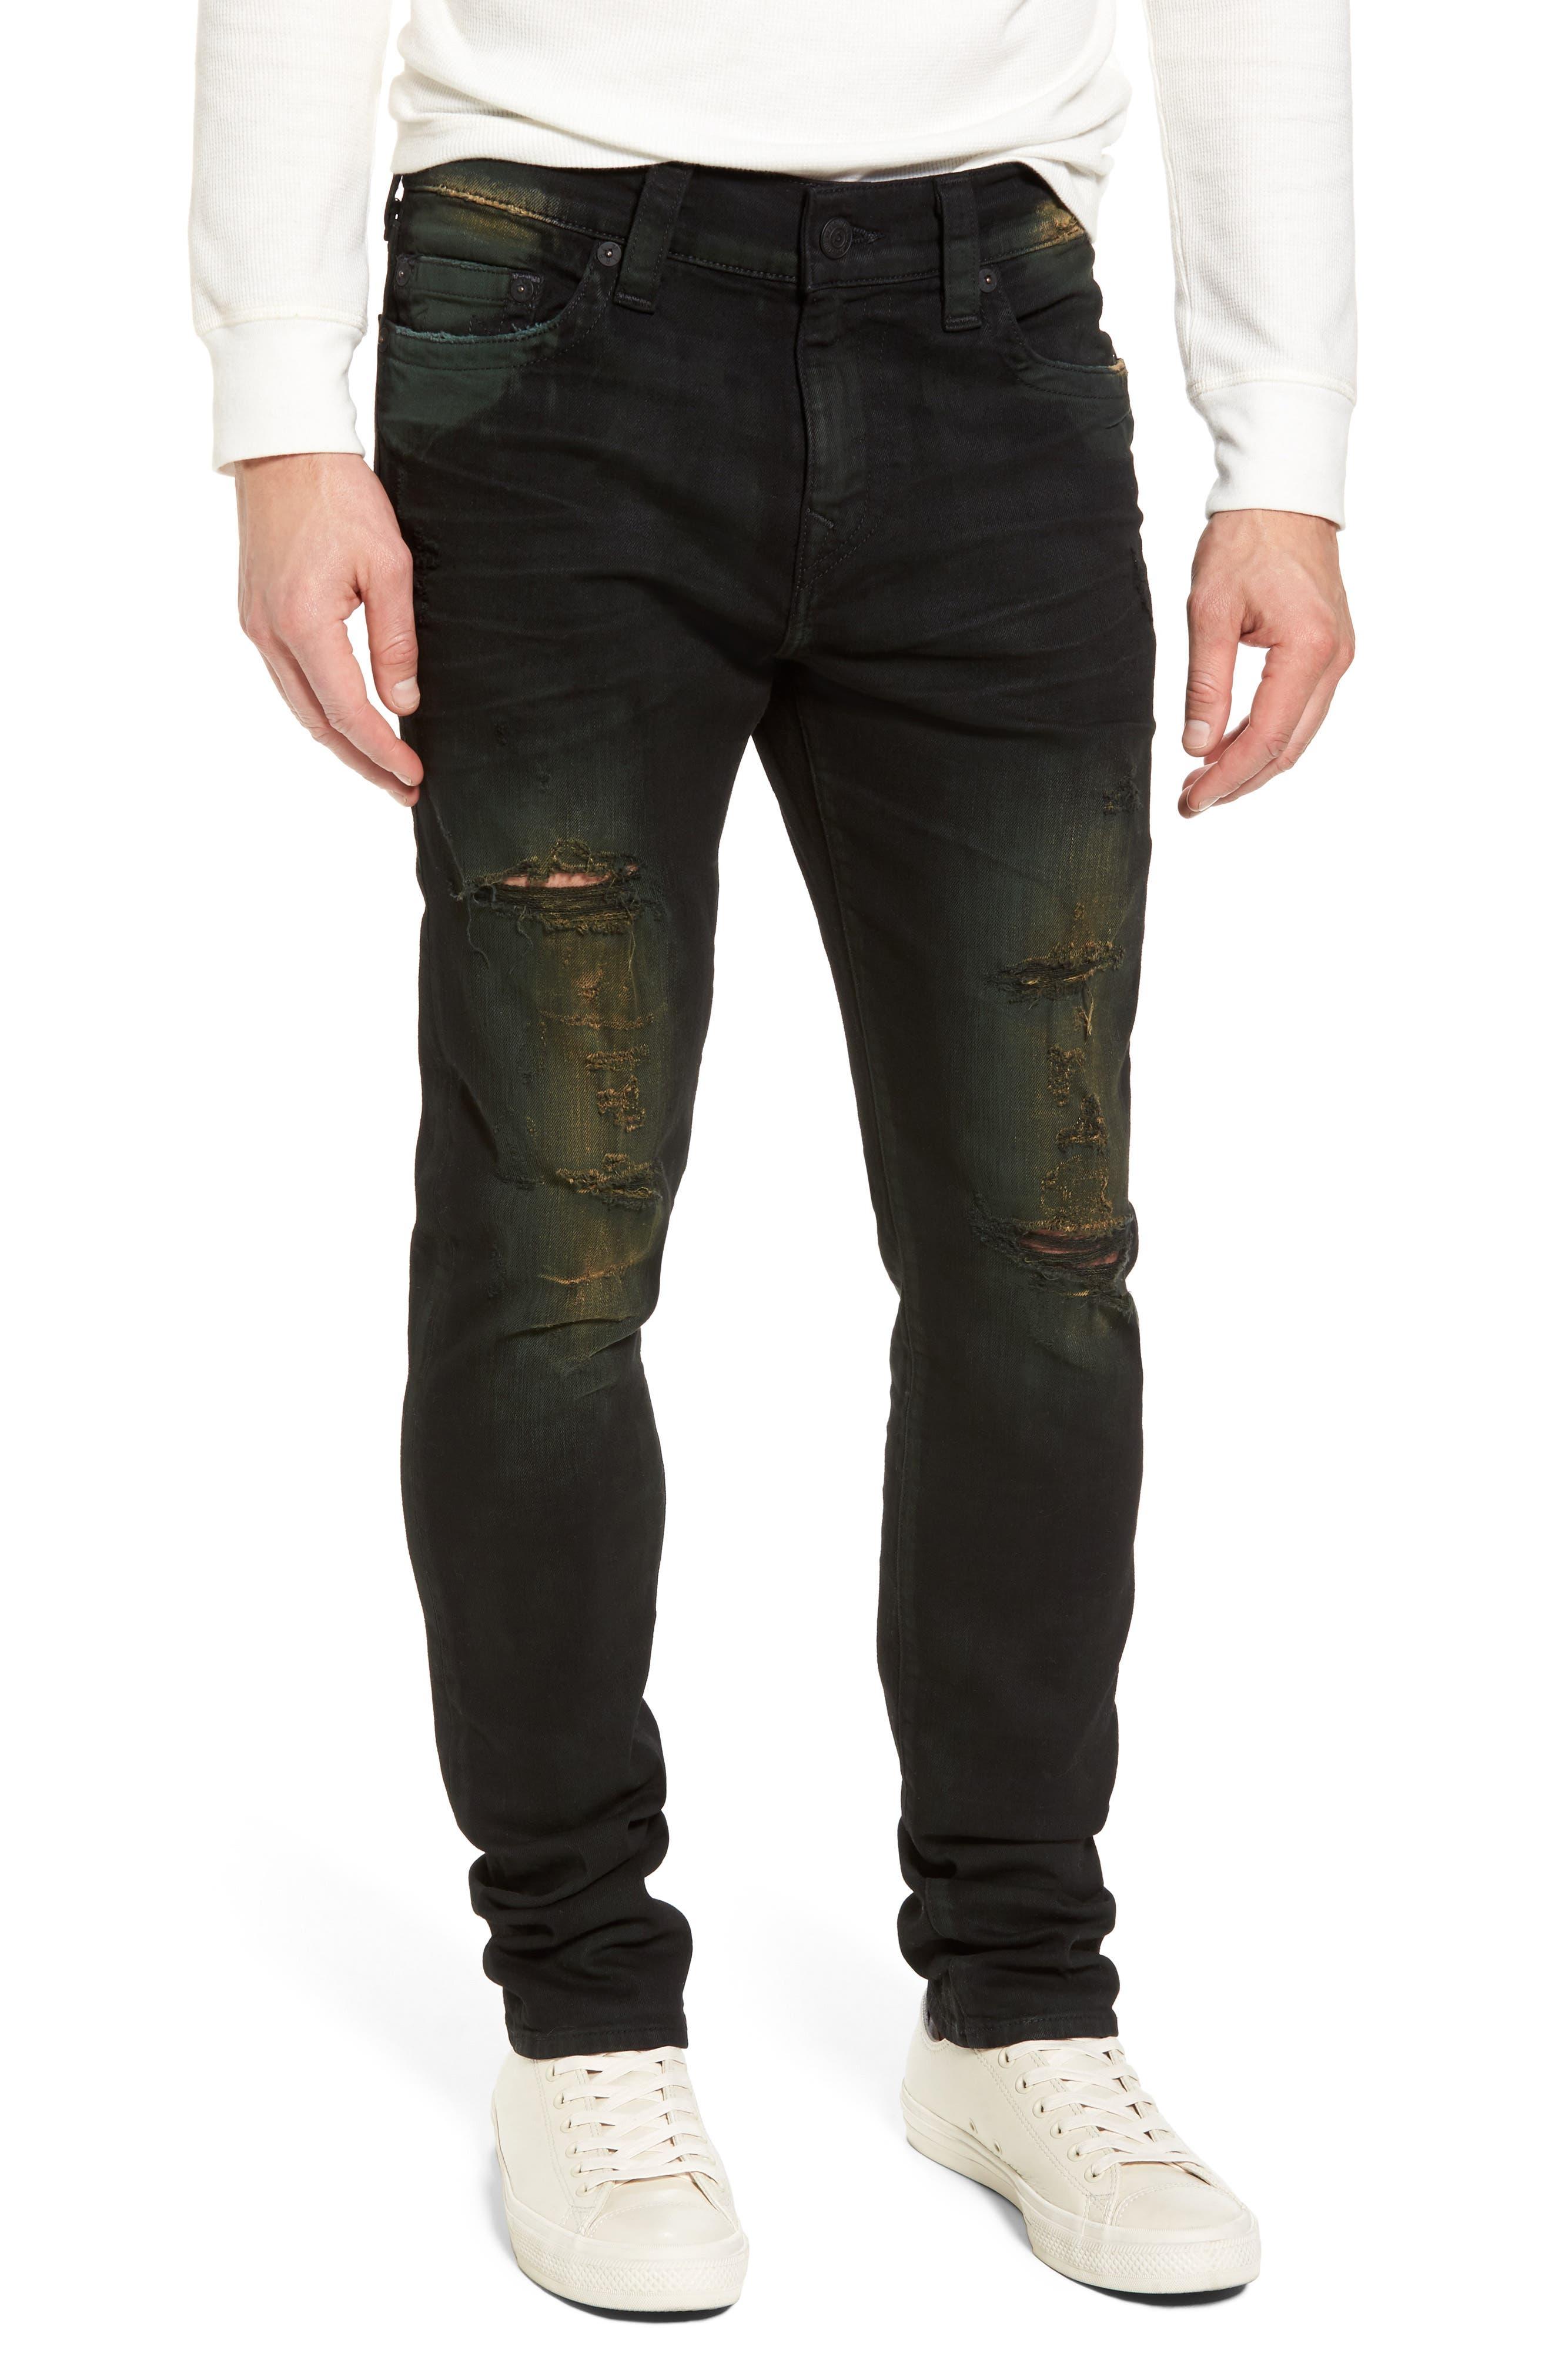 Alternate Image 1 Selected - True Religion Brand Jeans Rocco Skinny Fit Jeans (Green Blaze)